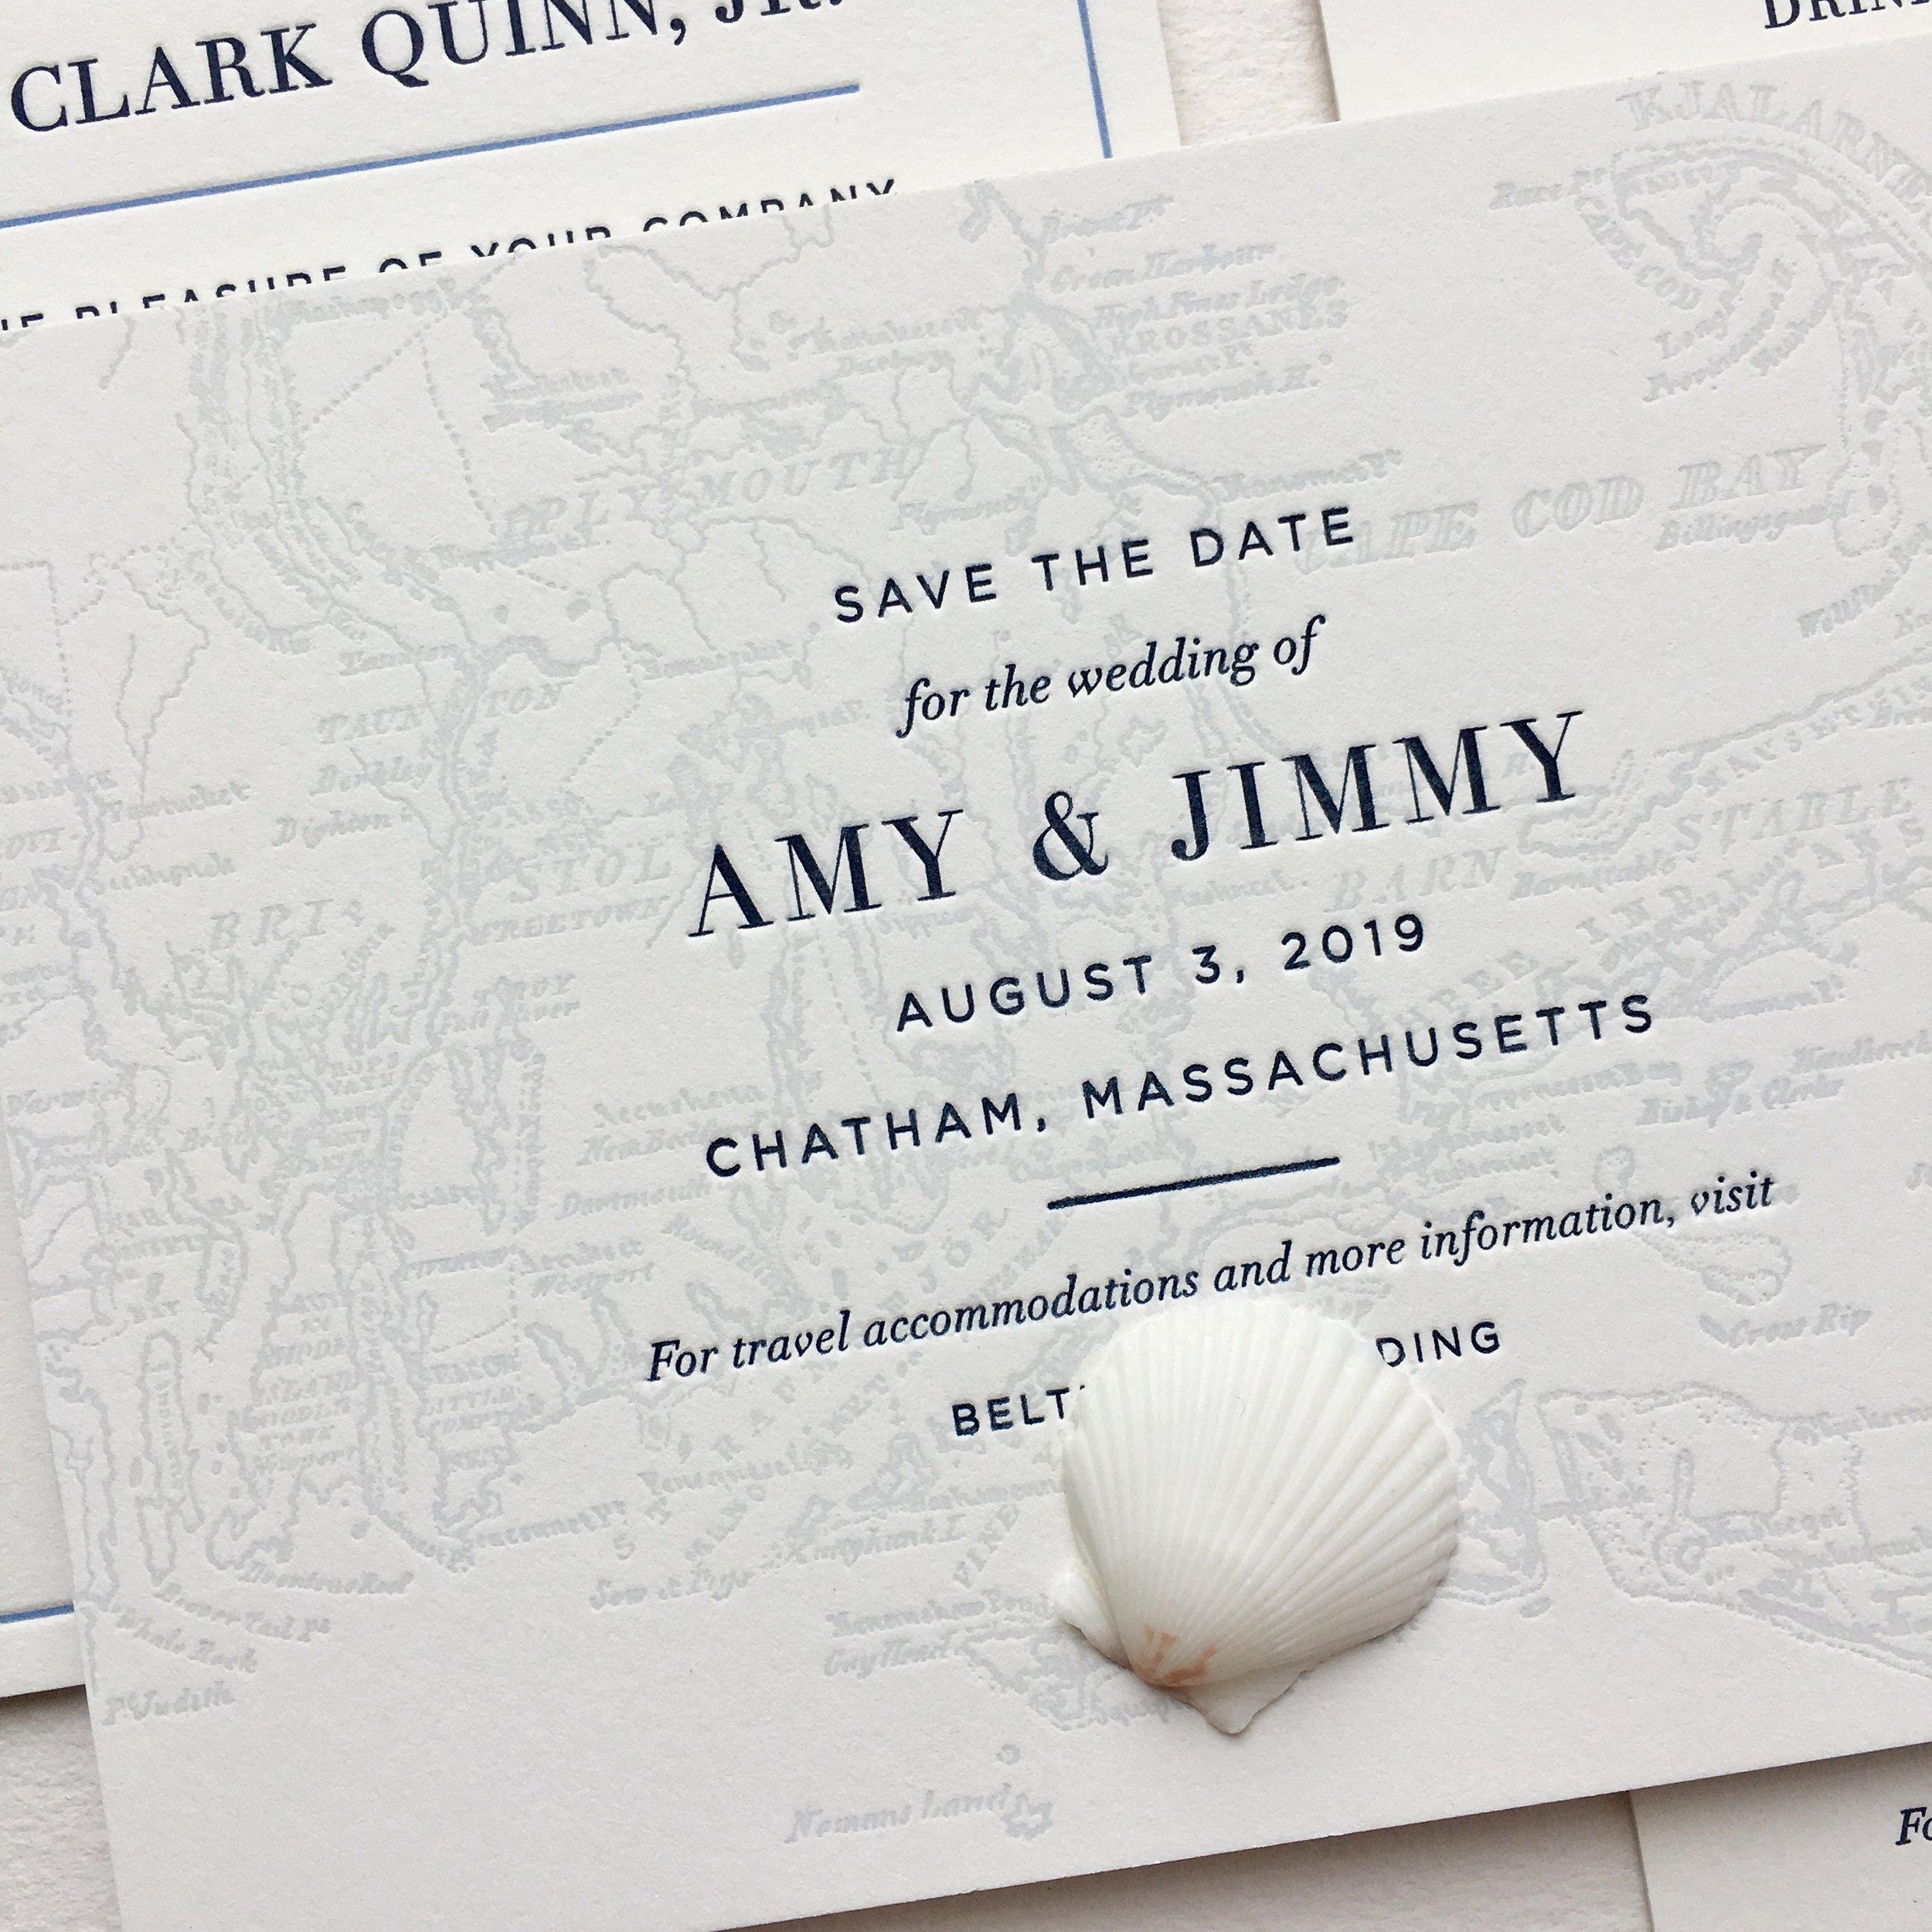 Hudson_Amy&Jimmy_3.jpg